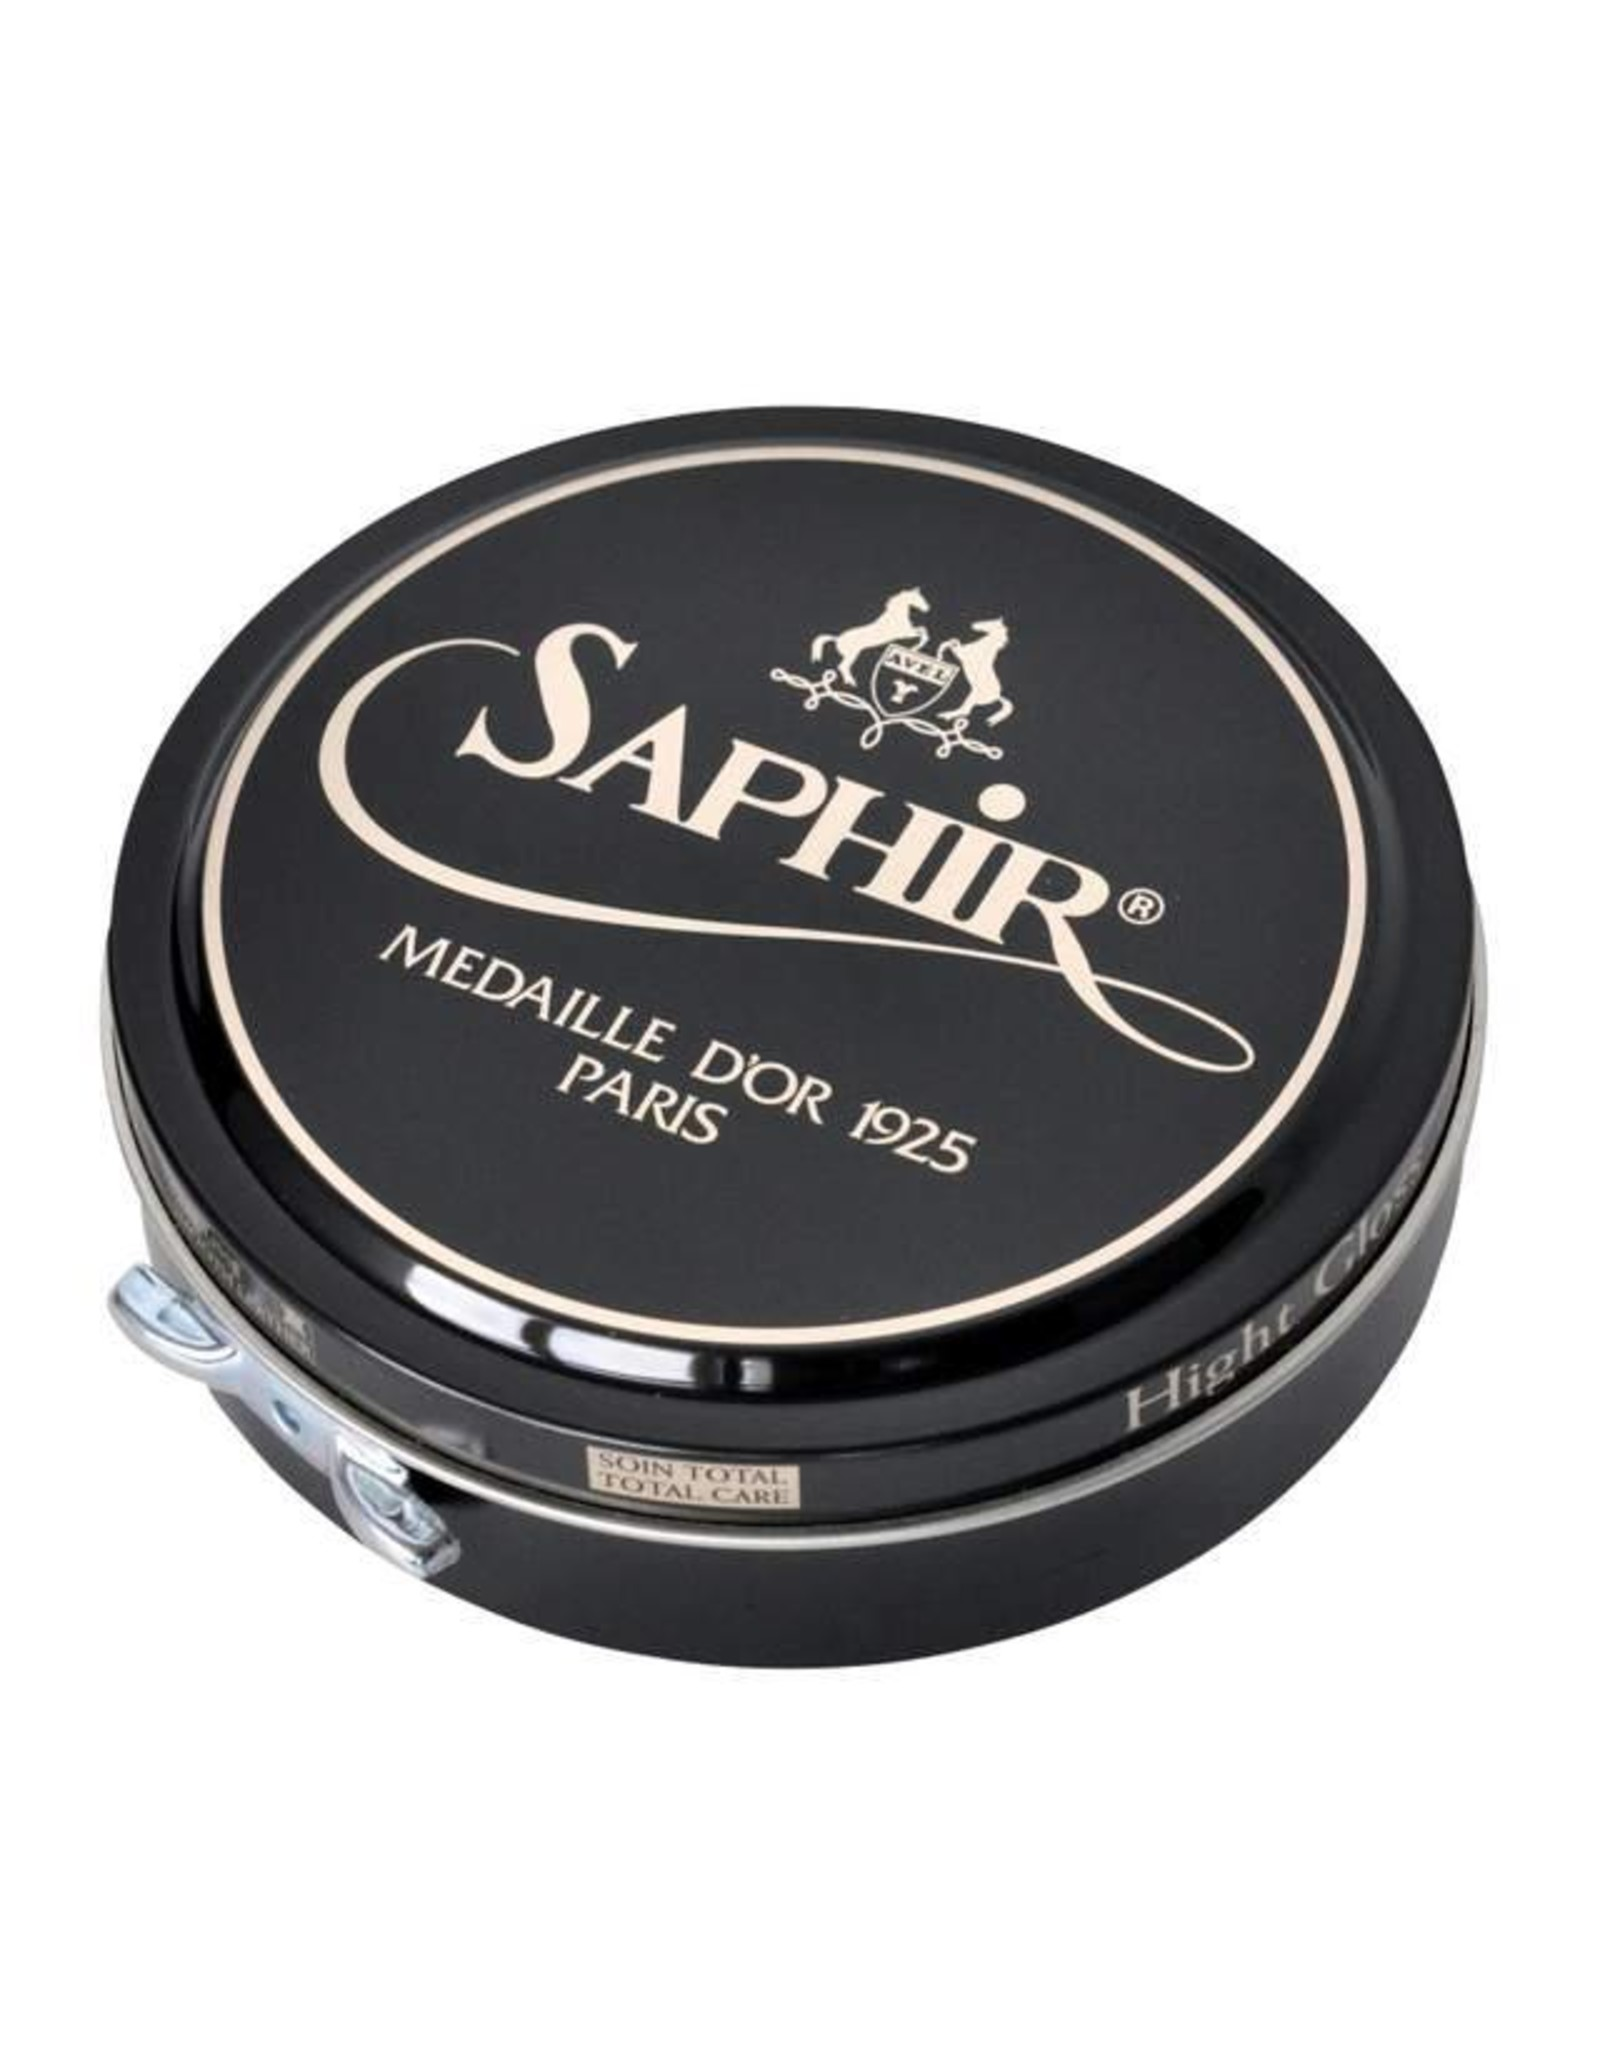 Saphir Medaille D'or Pate De Luxe - Wax Shoe Polish 100ml